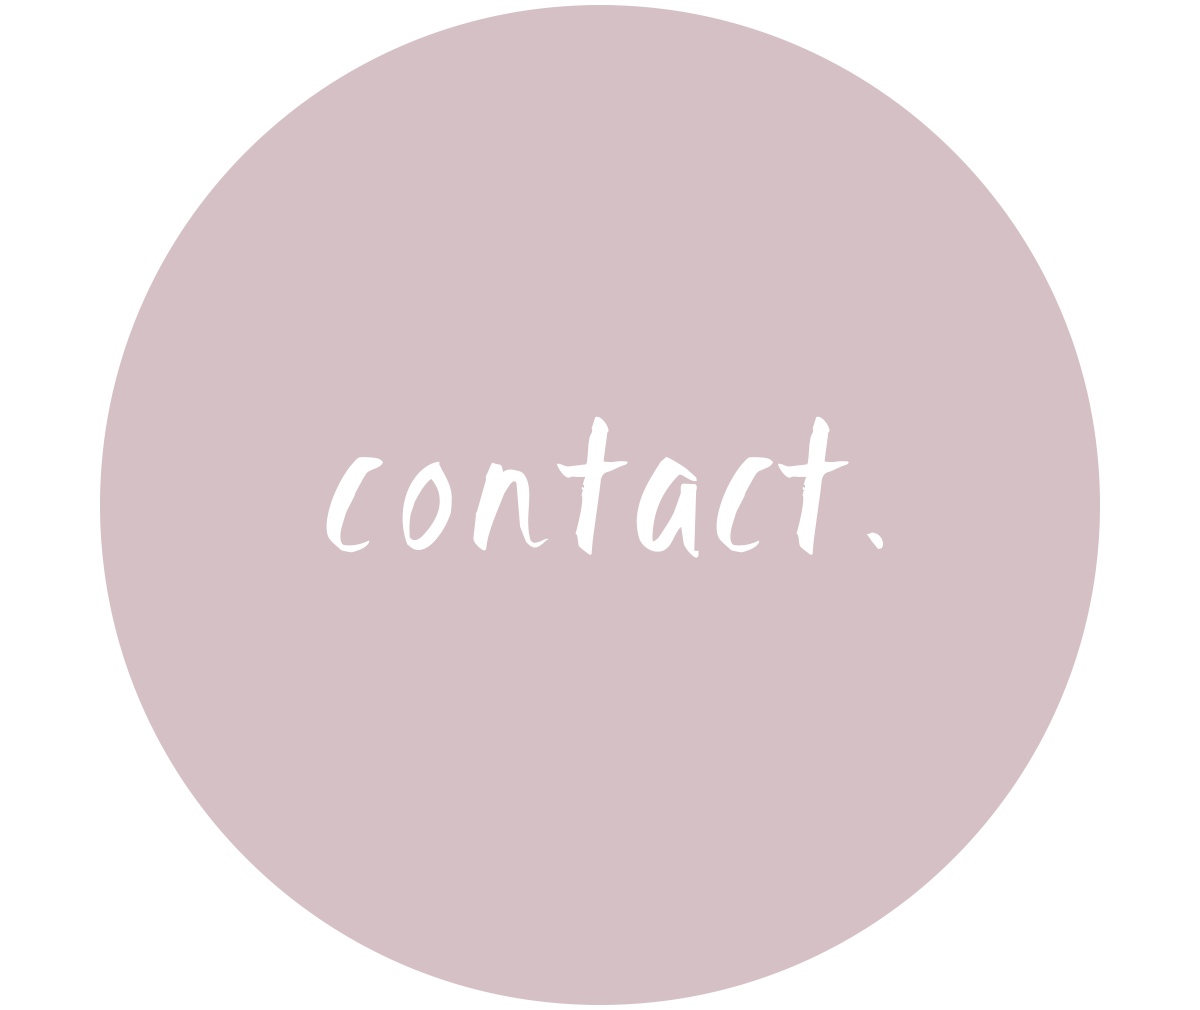 contactcircle.png